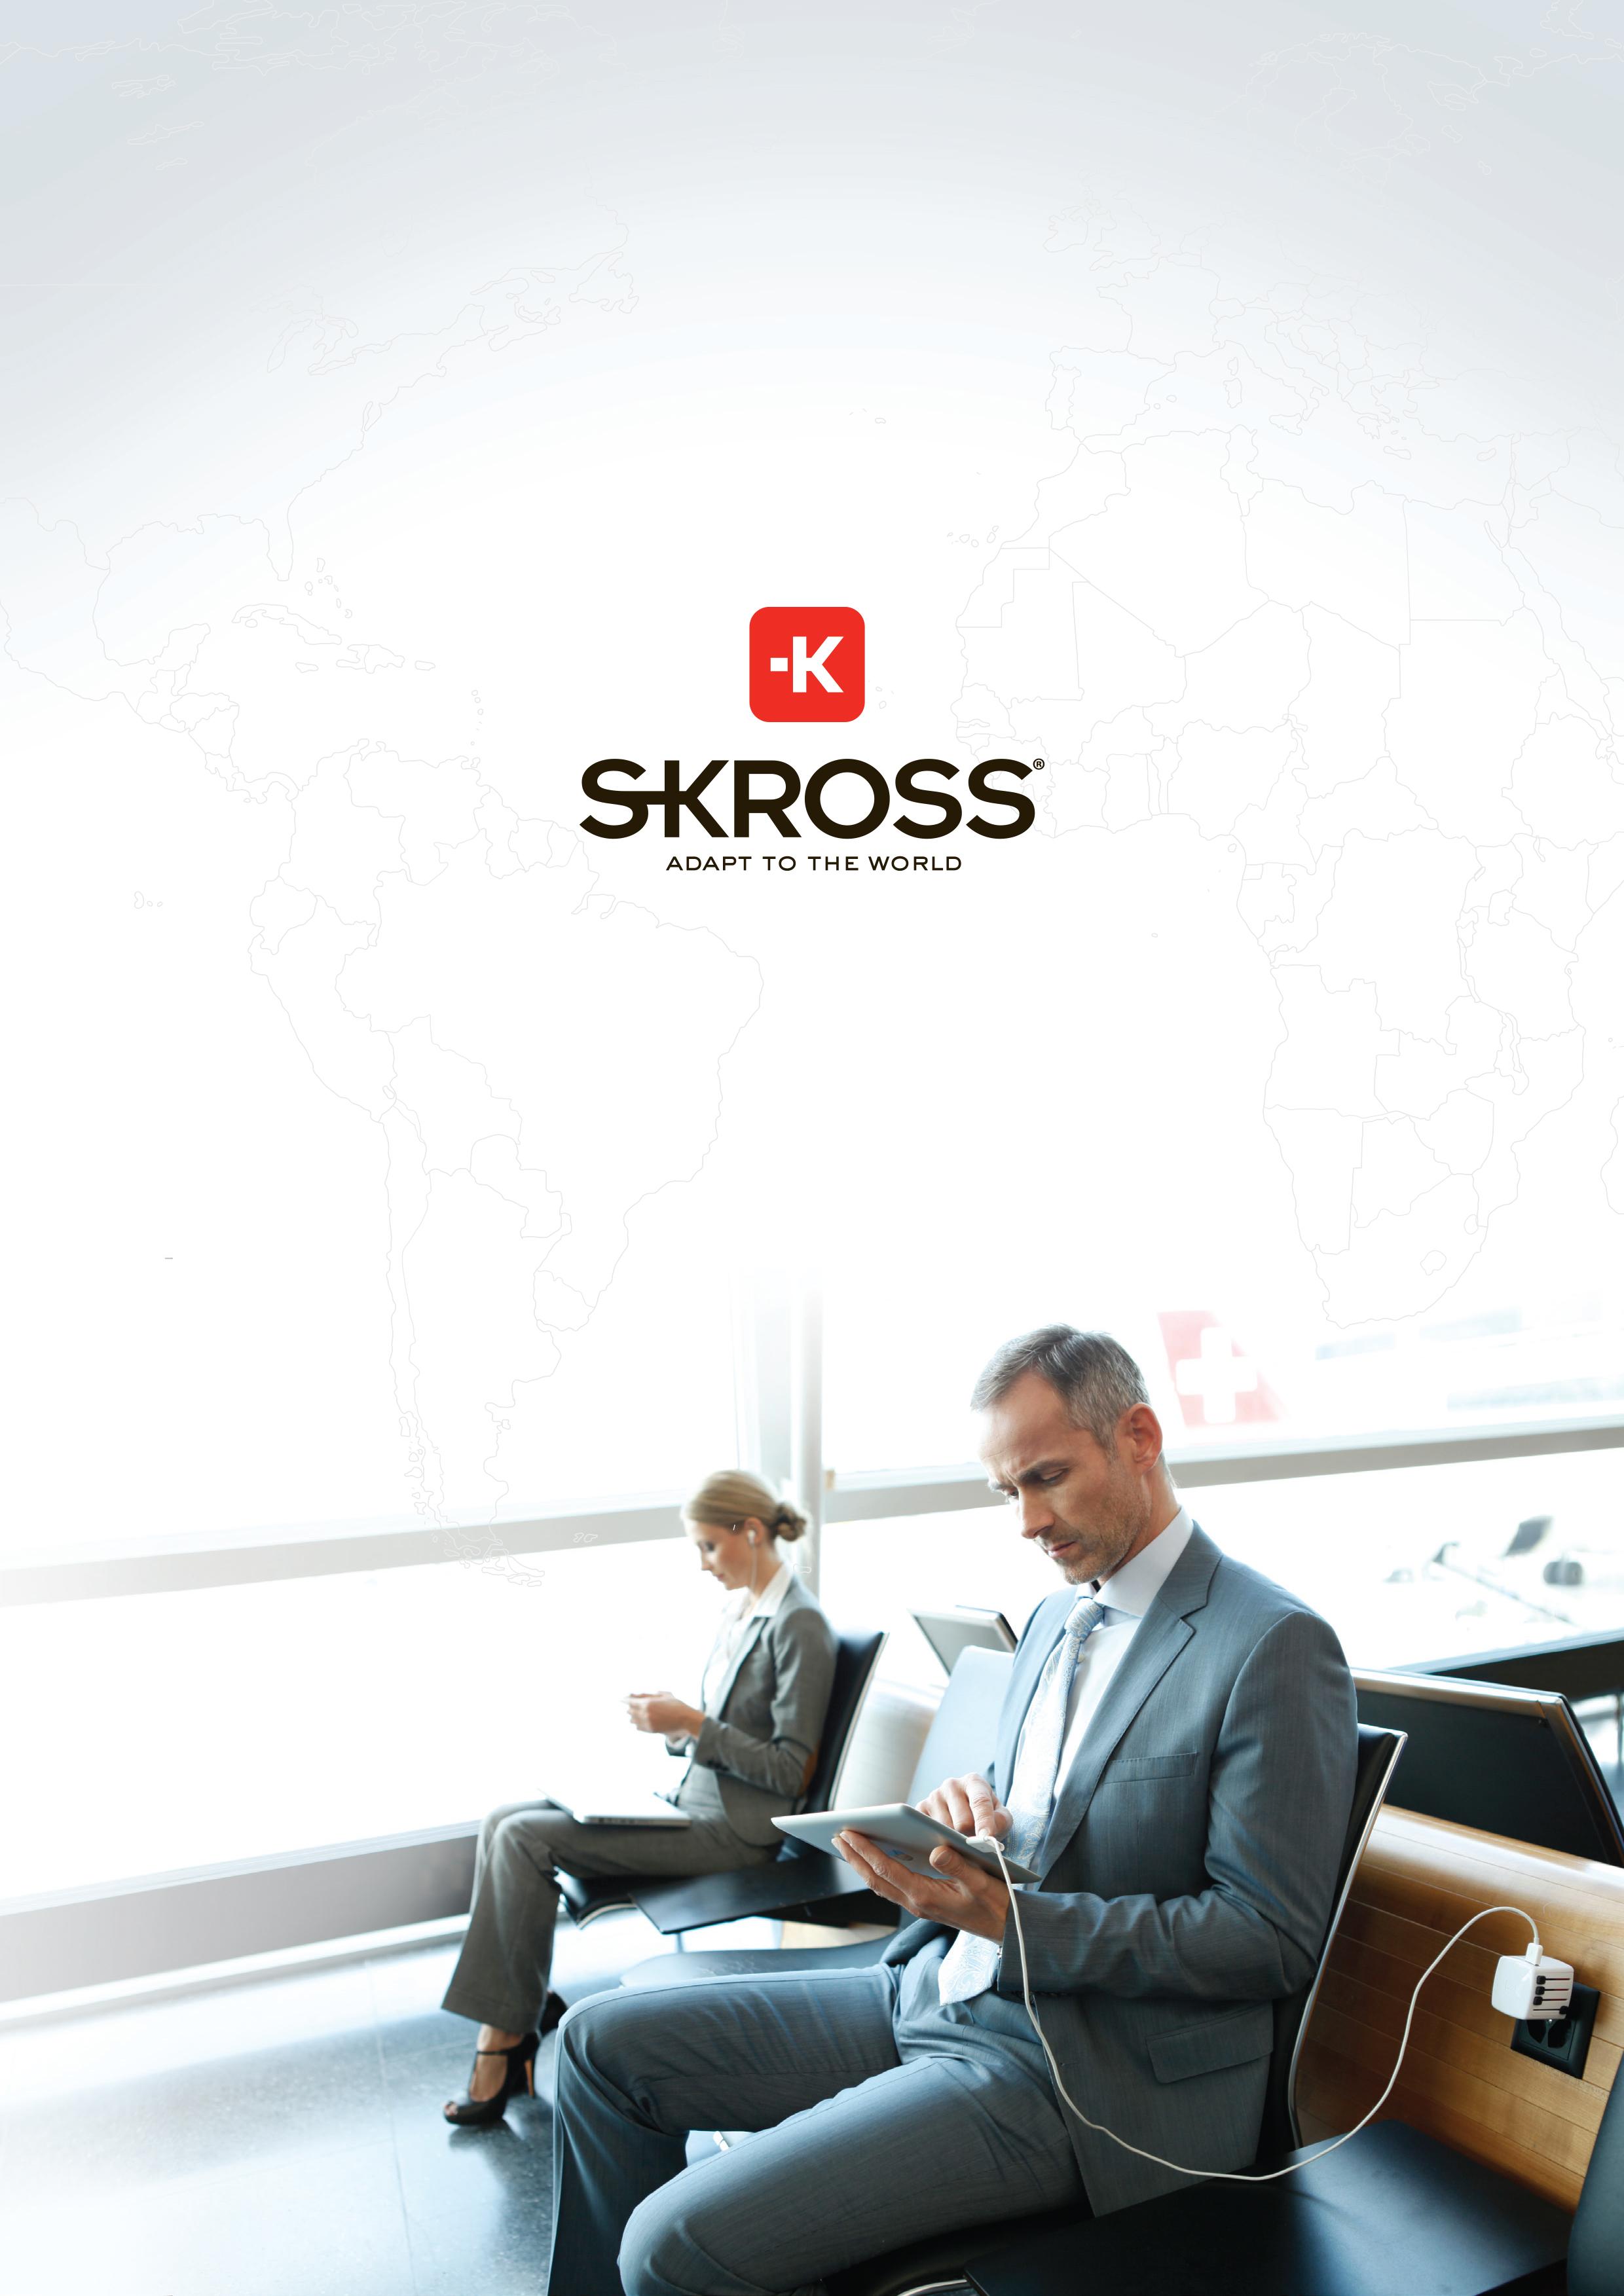 skross-adapt-to-the-world-accessories-adaptors-chargers_scorpio-worldwide_travel-retail-distributor